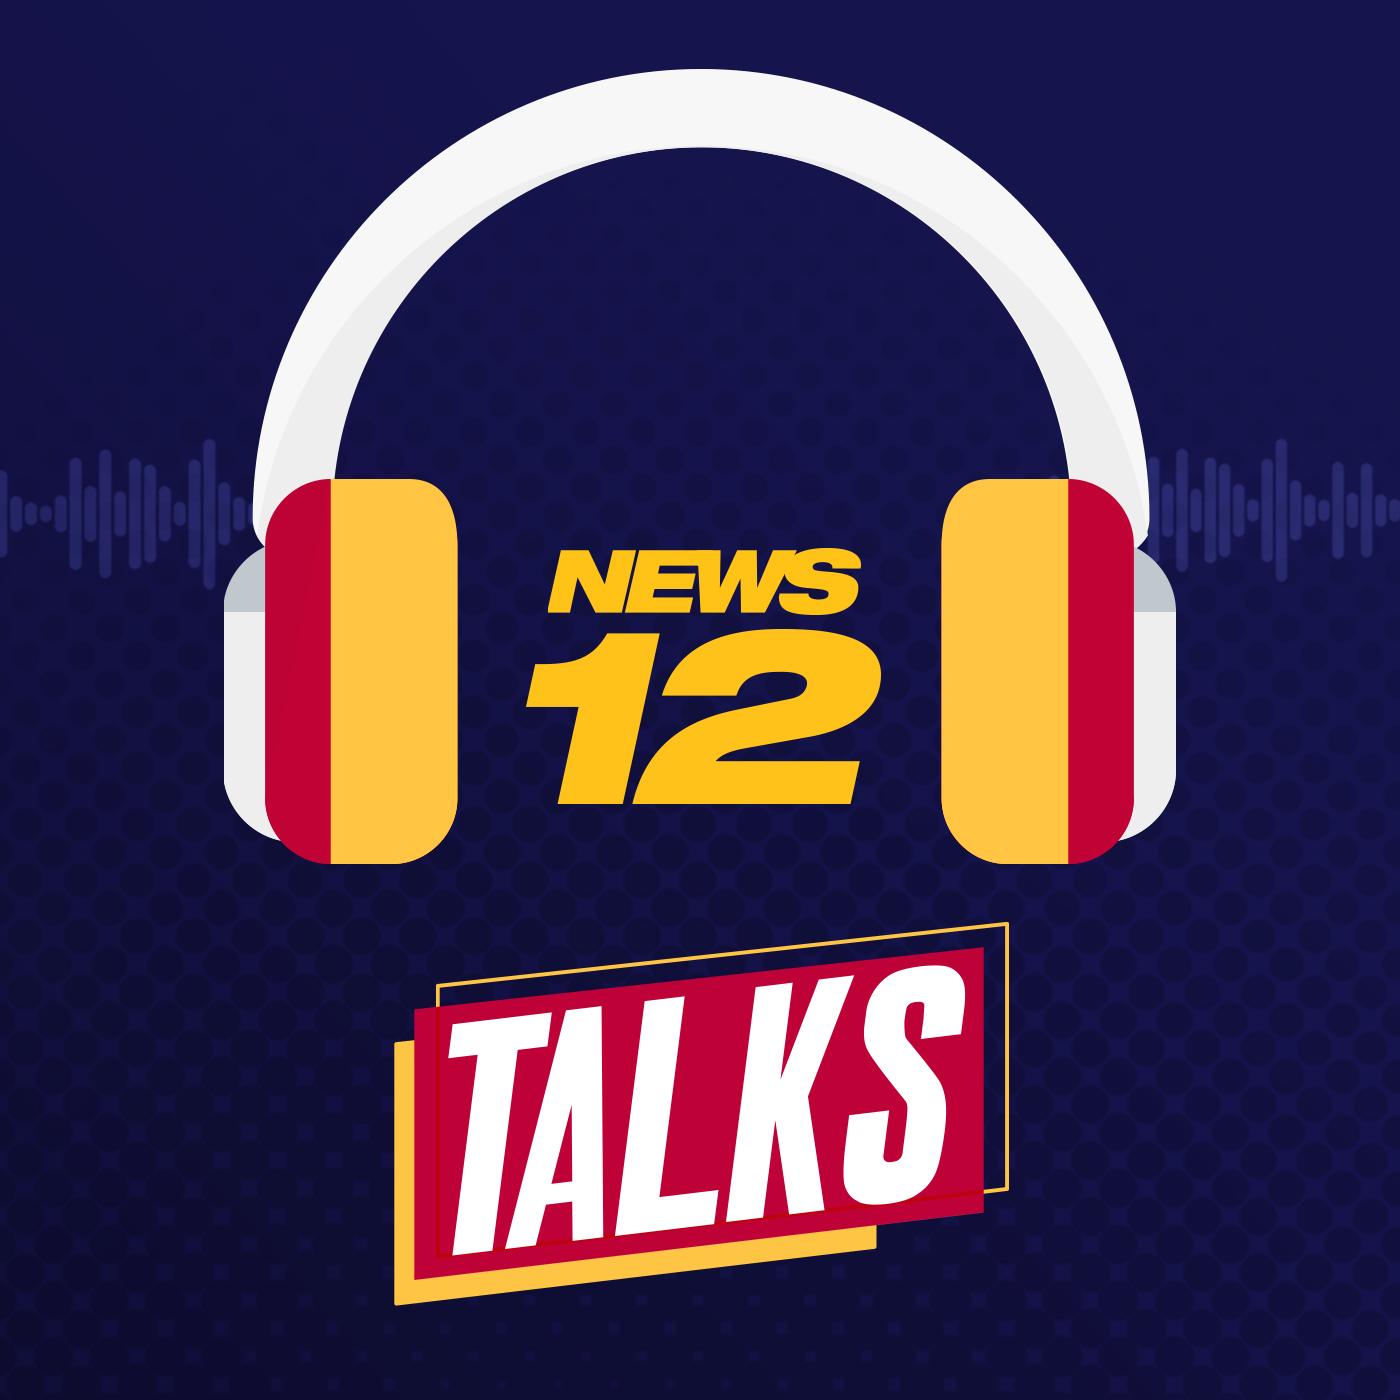 News 12 Talks Hudson Valley | Listen via Stitcher for Podcasts